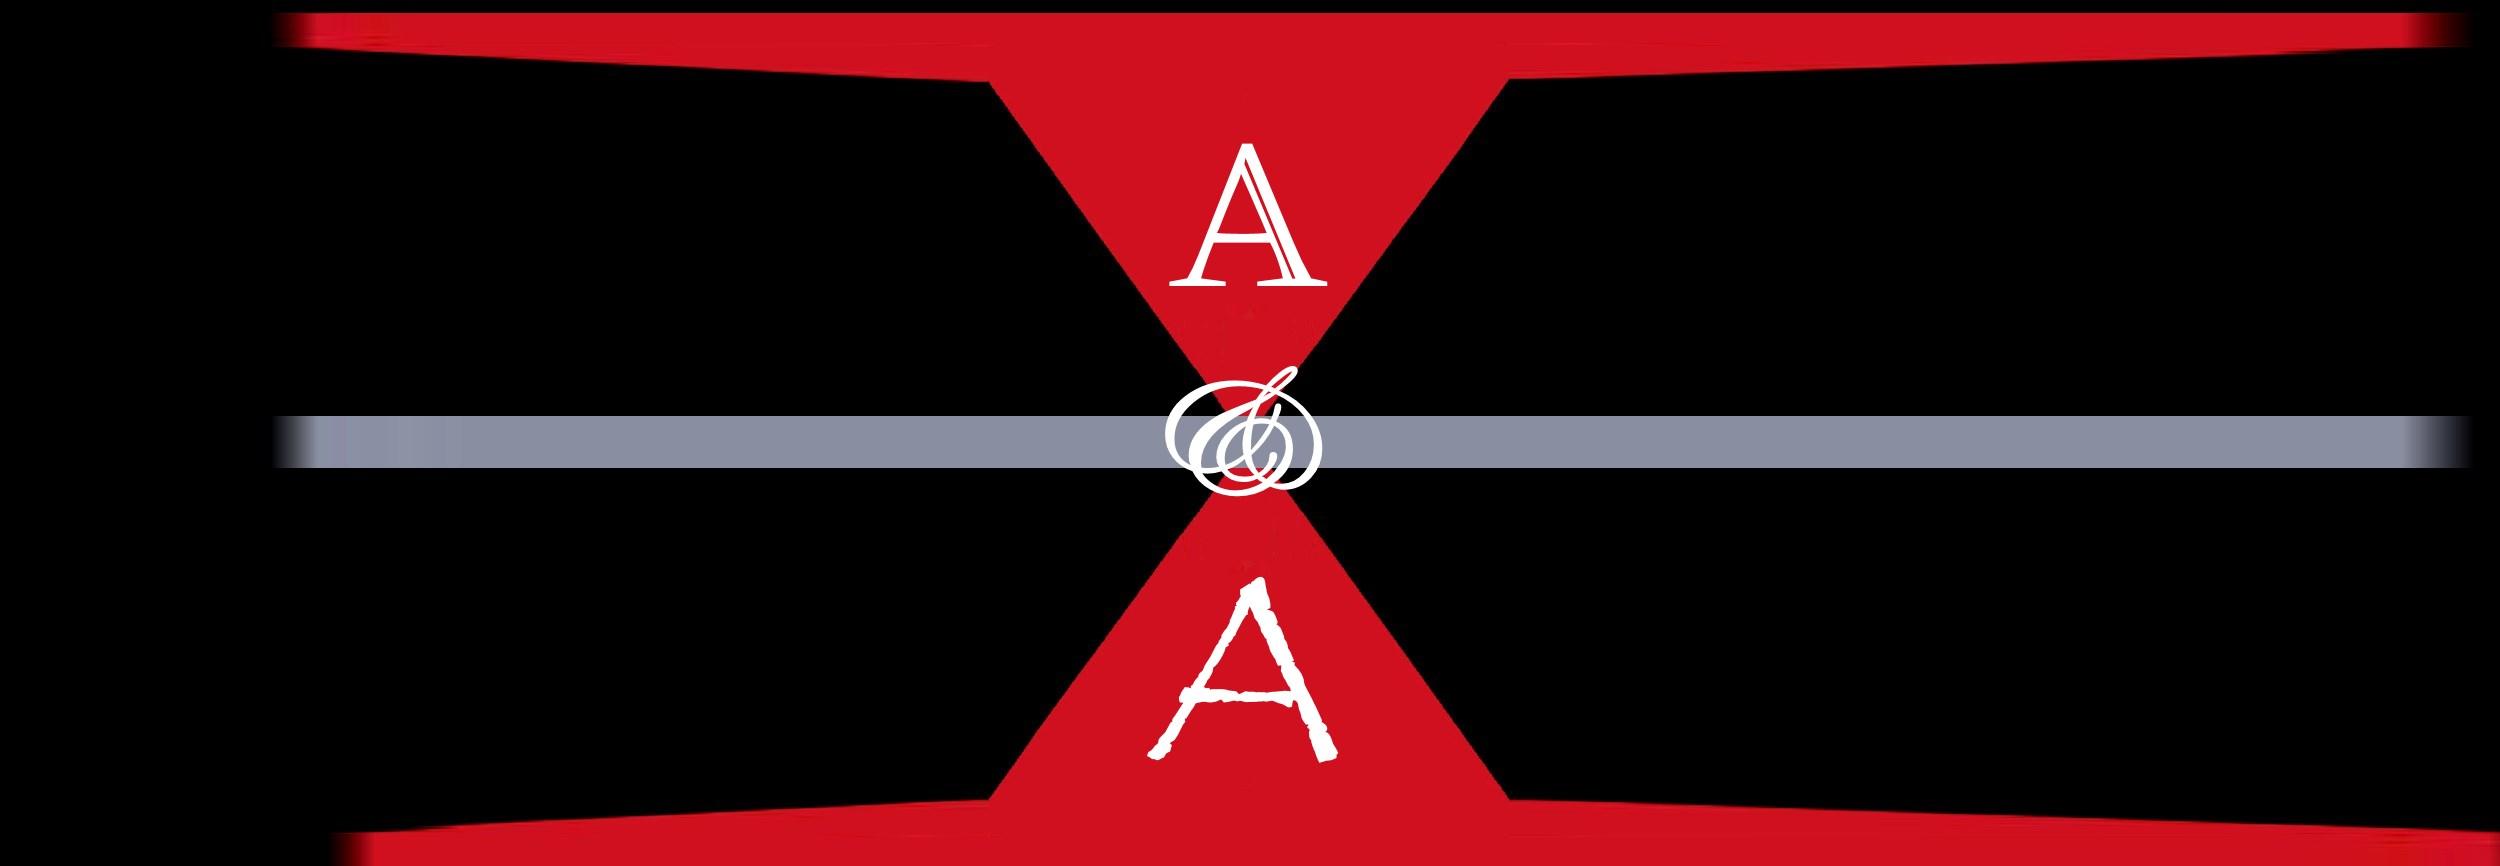 Aleister & Adolf